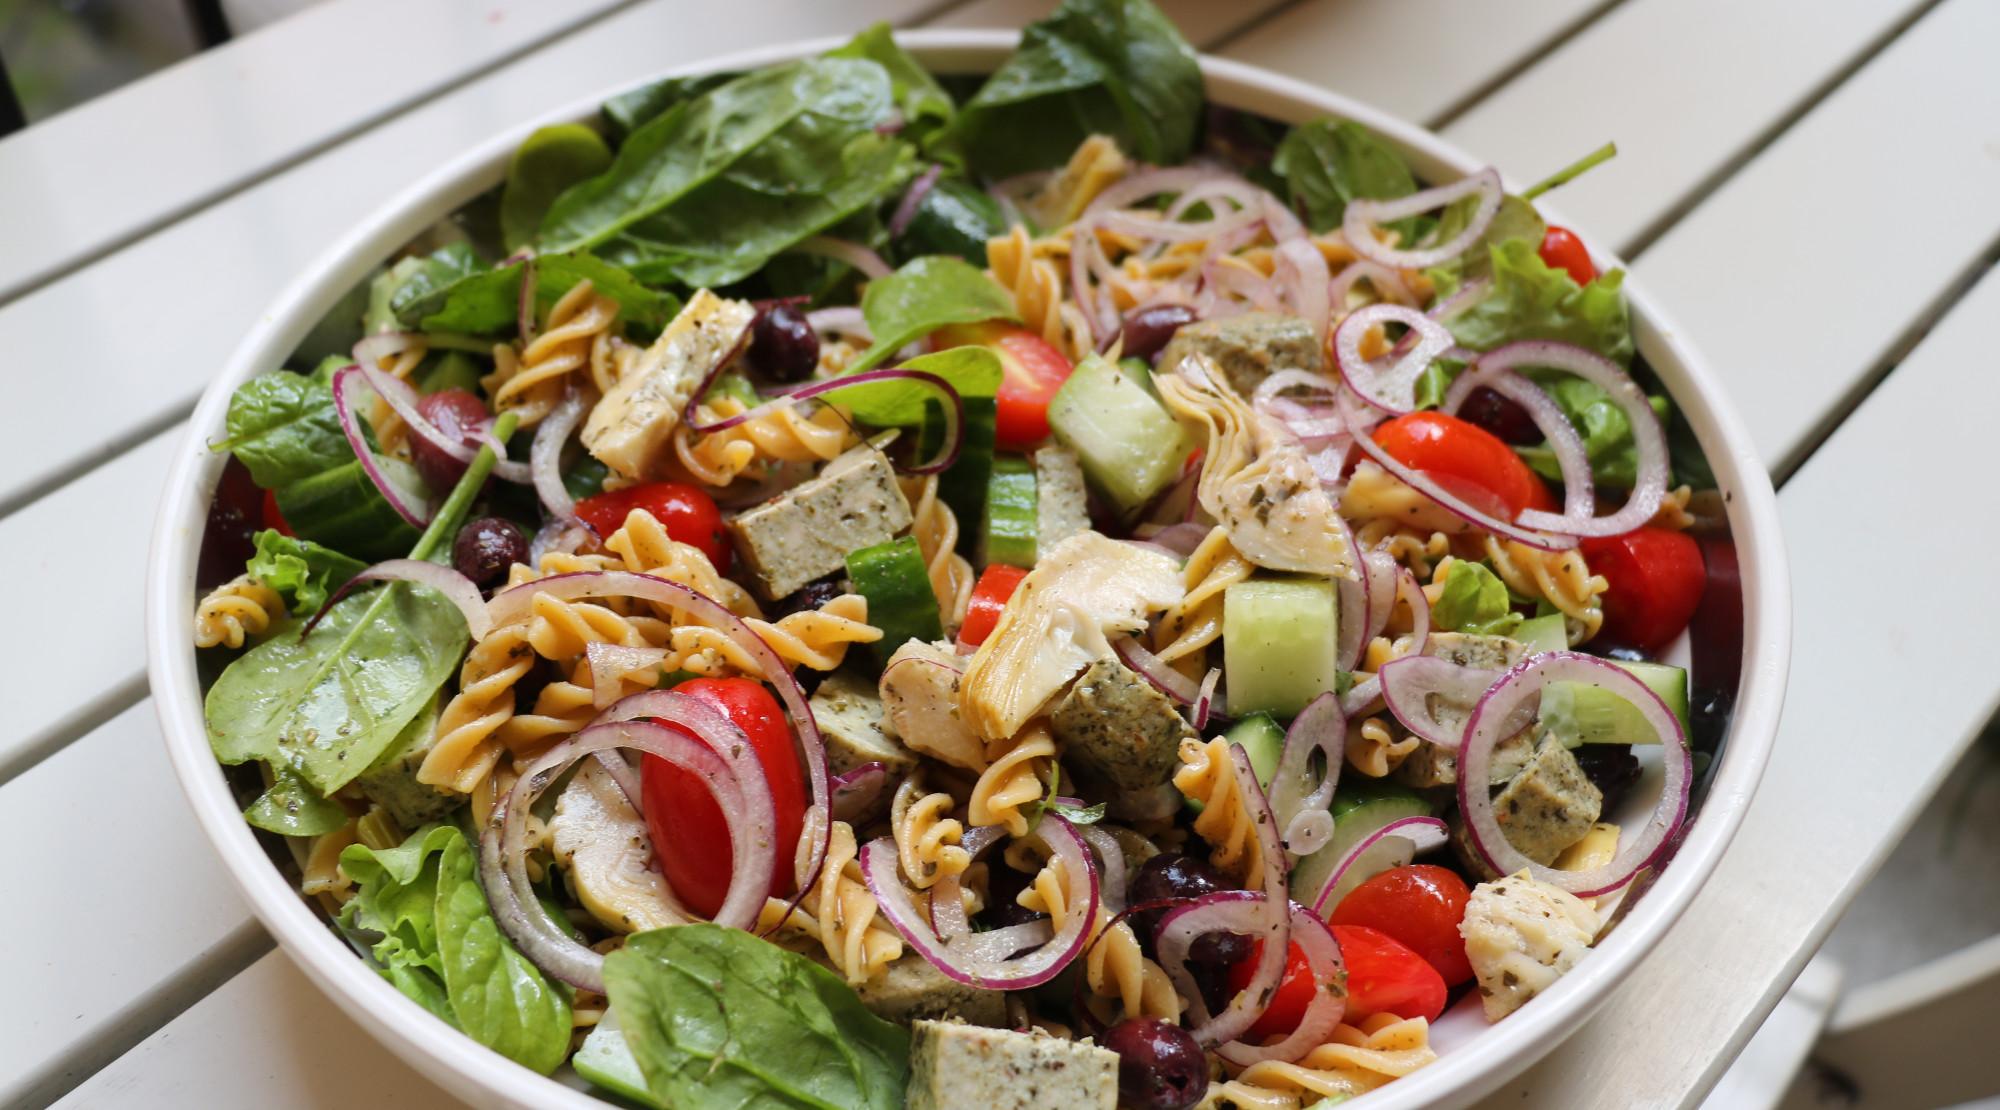 proteinrika vegetariska livsmedel